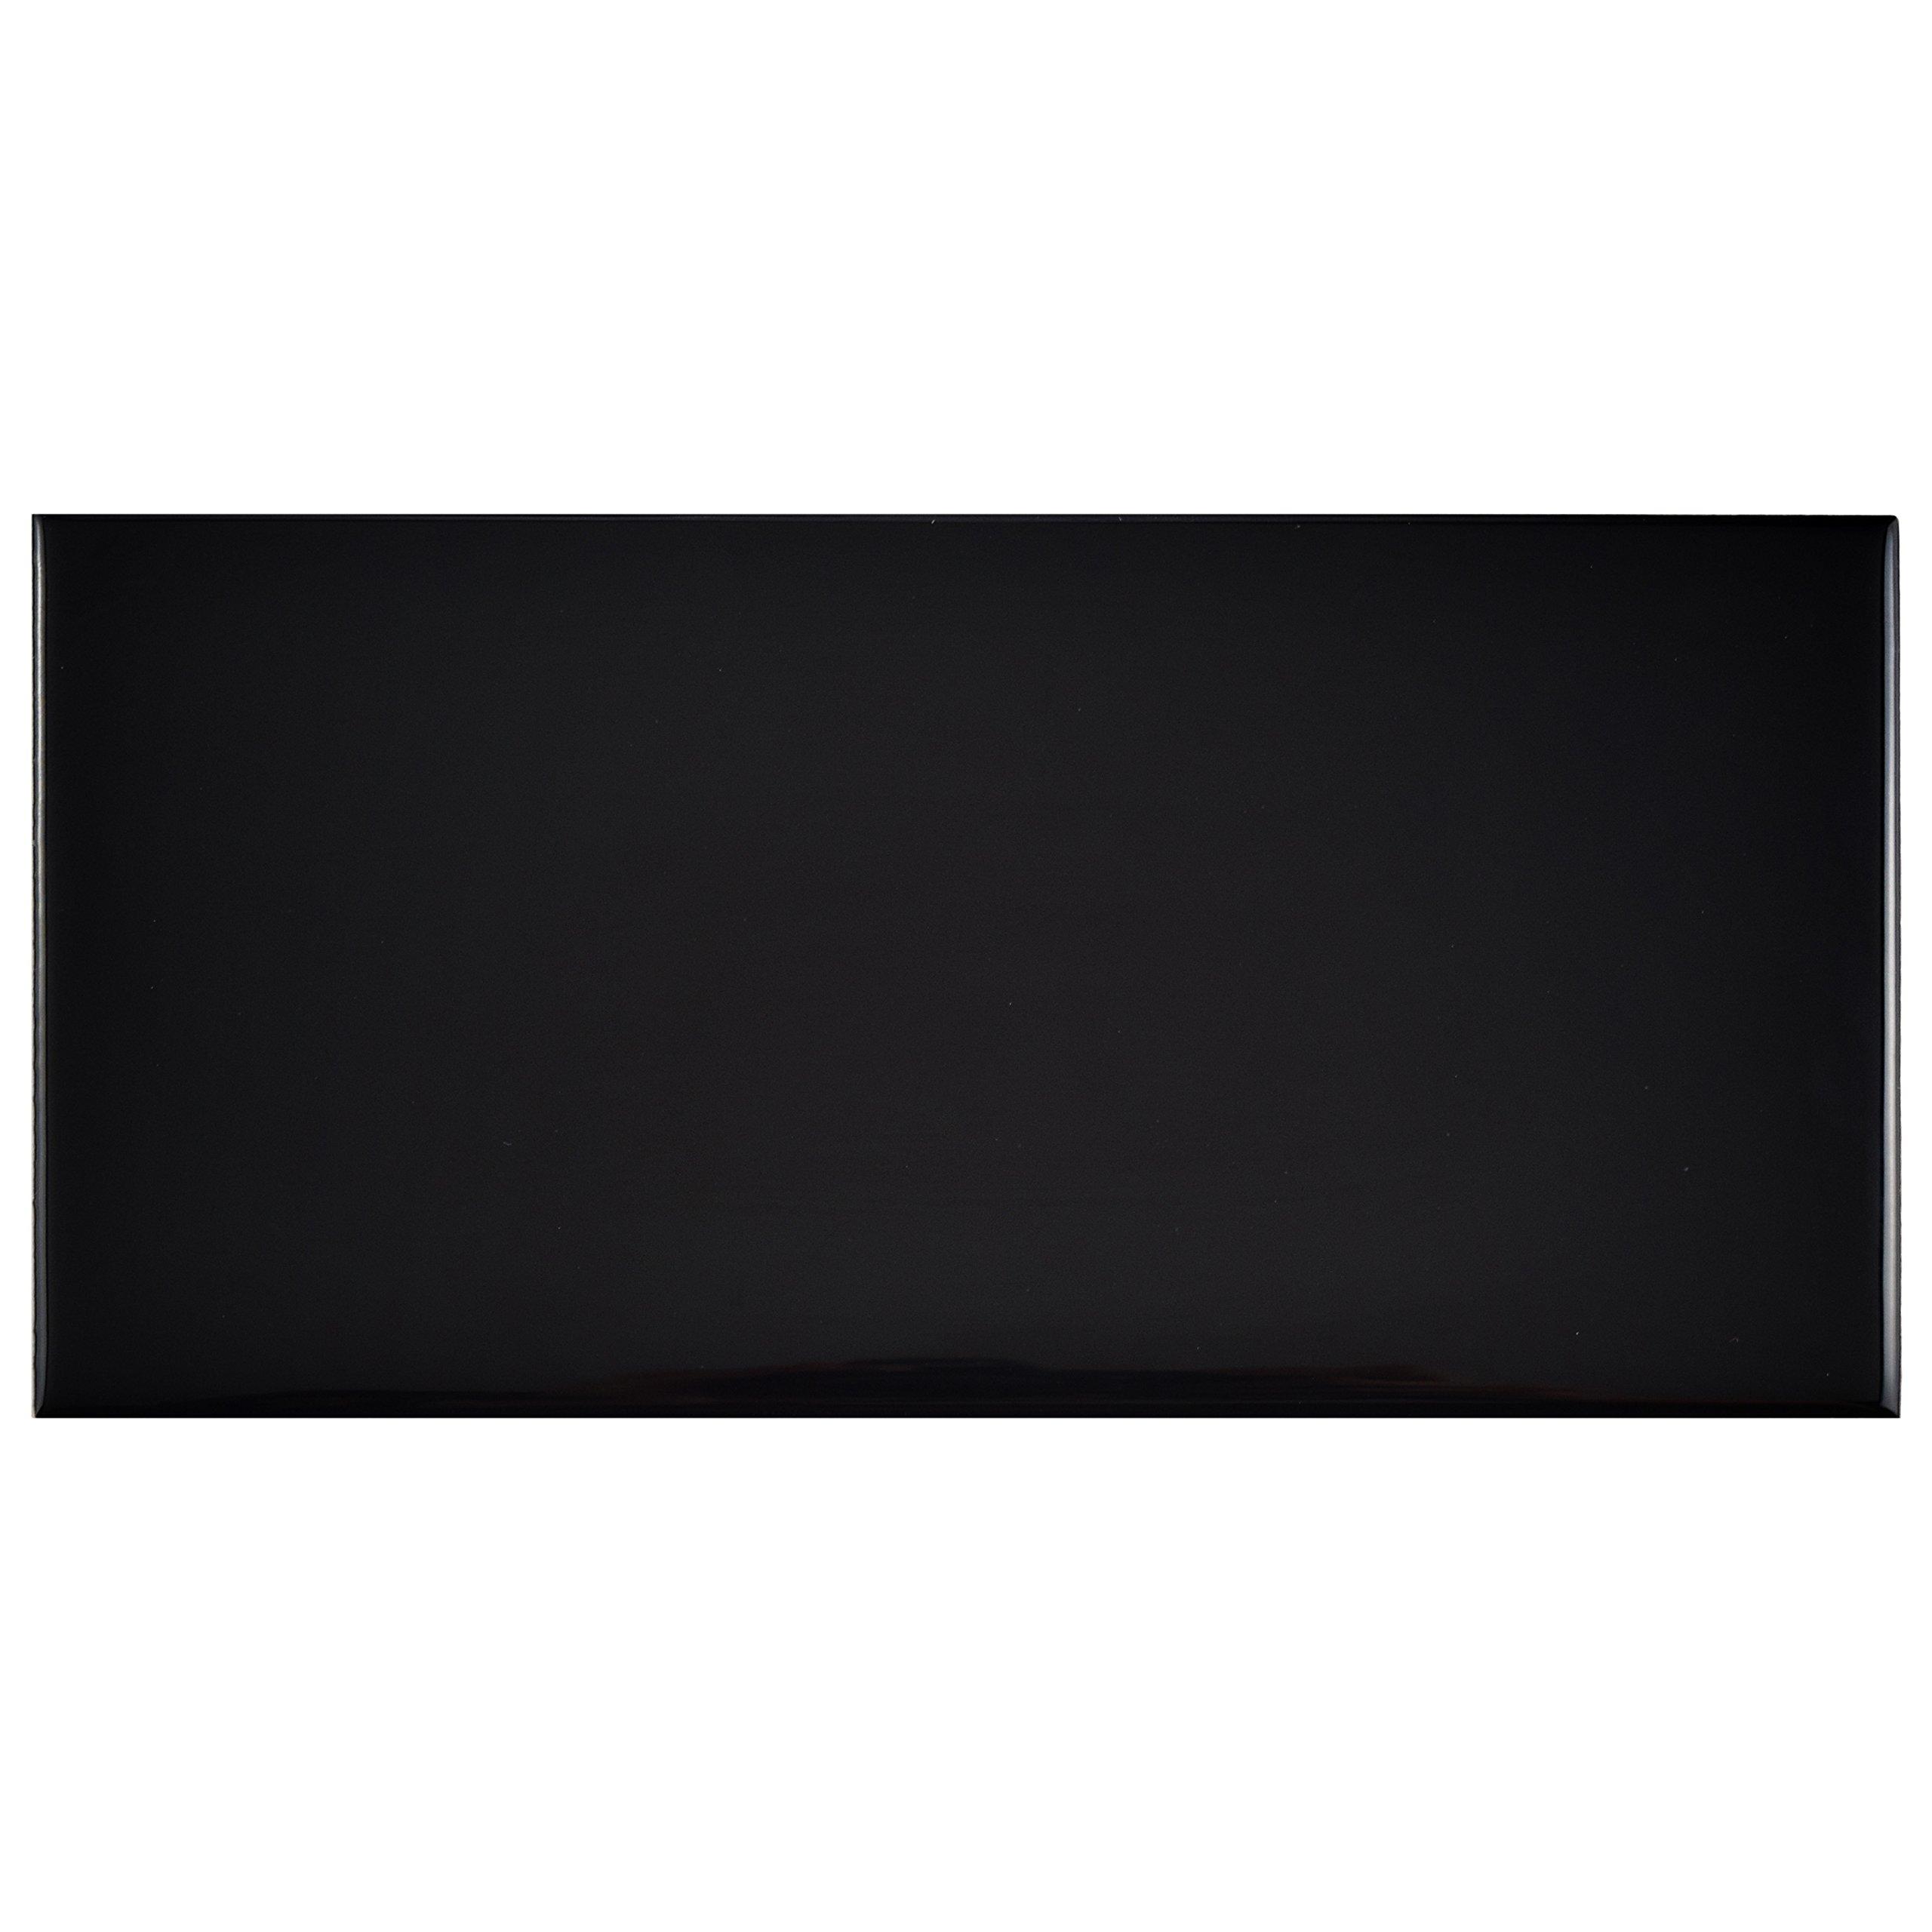 SomerTile WXR3PSGB Pente Subway Ceramic Wall Tile, 3'' x 6'', White/Glossy Black